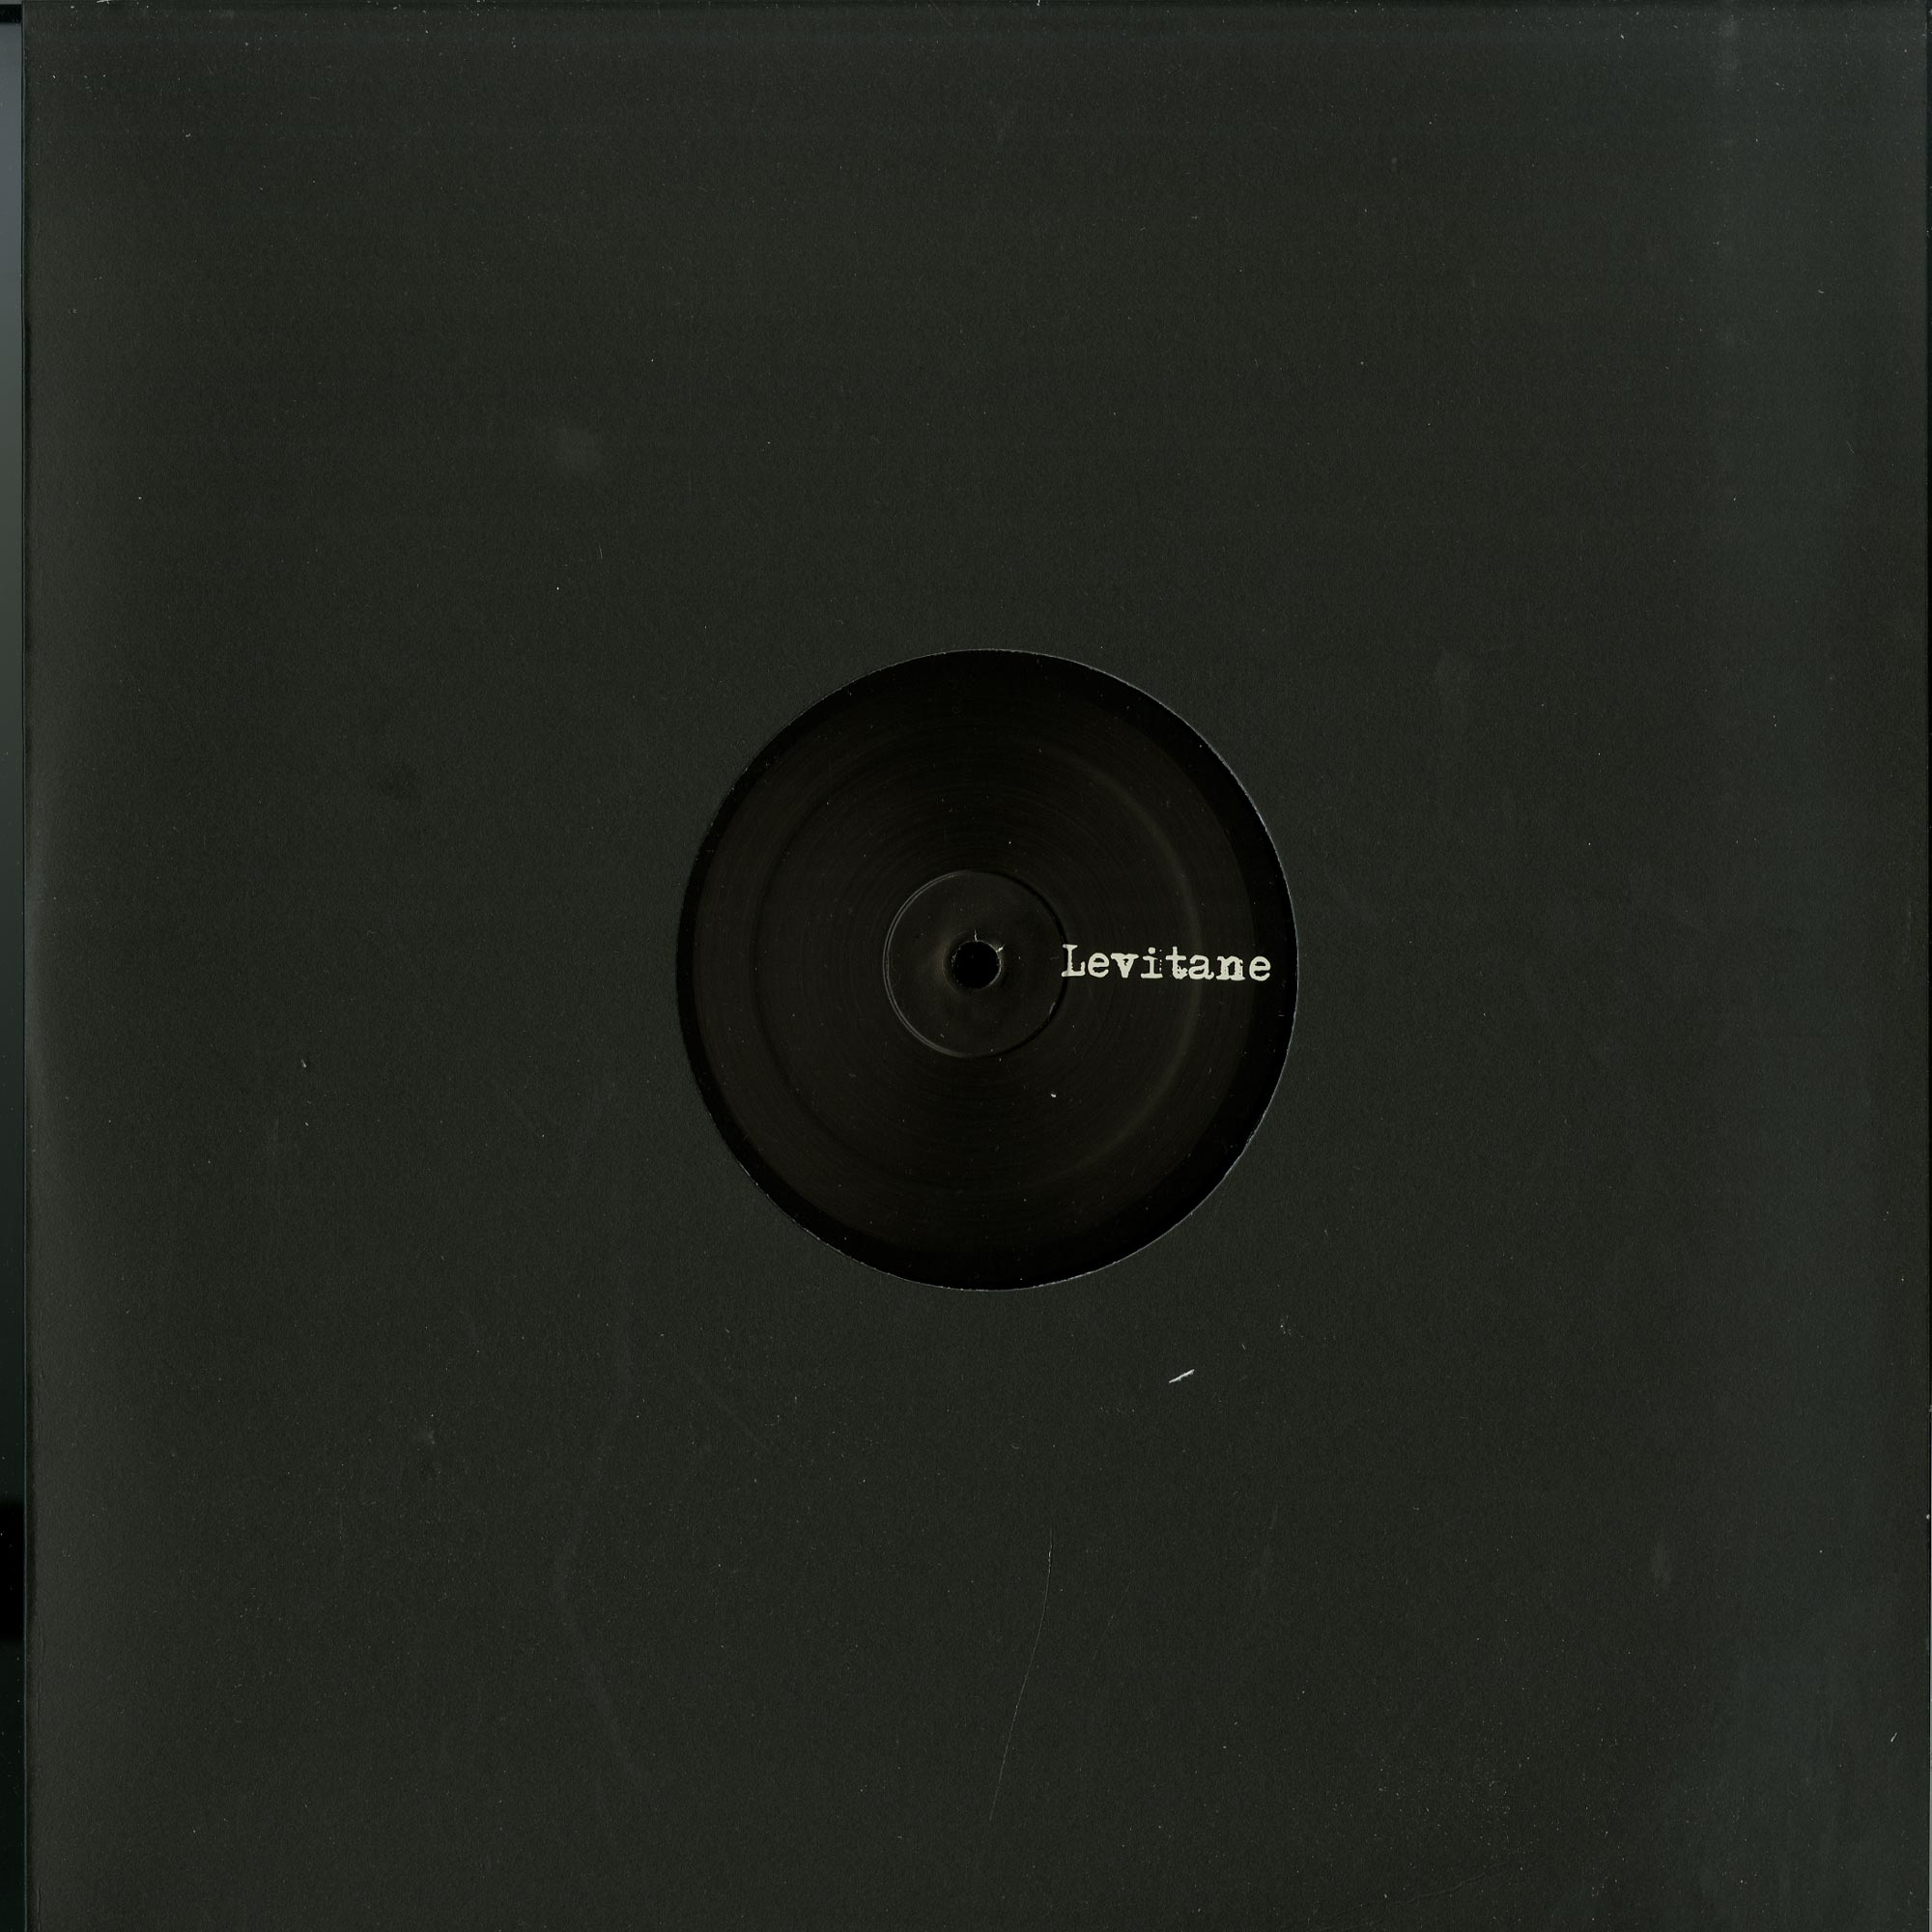 DiSKOP - 04